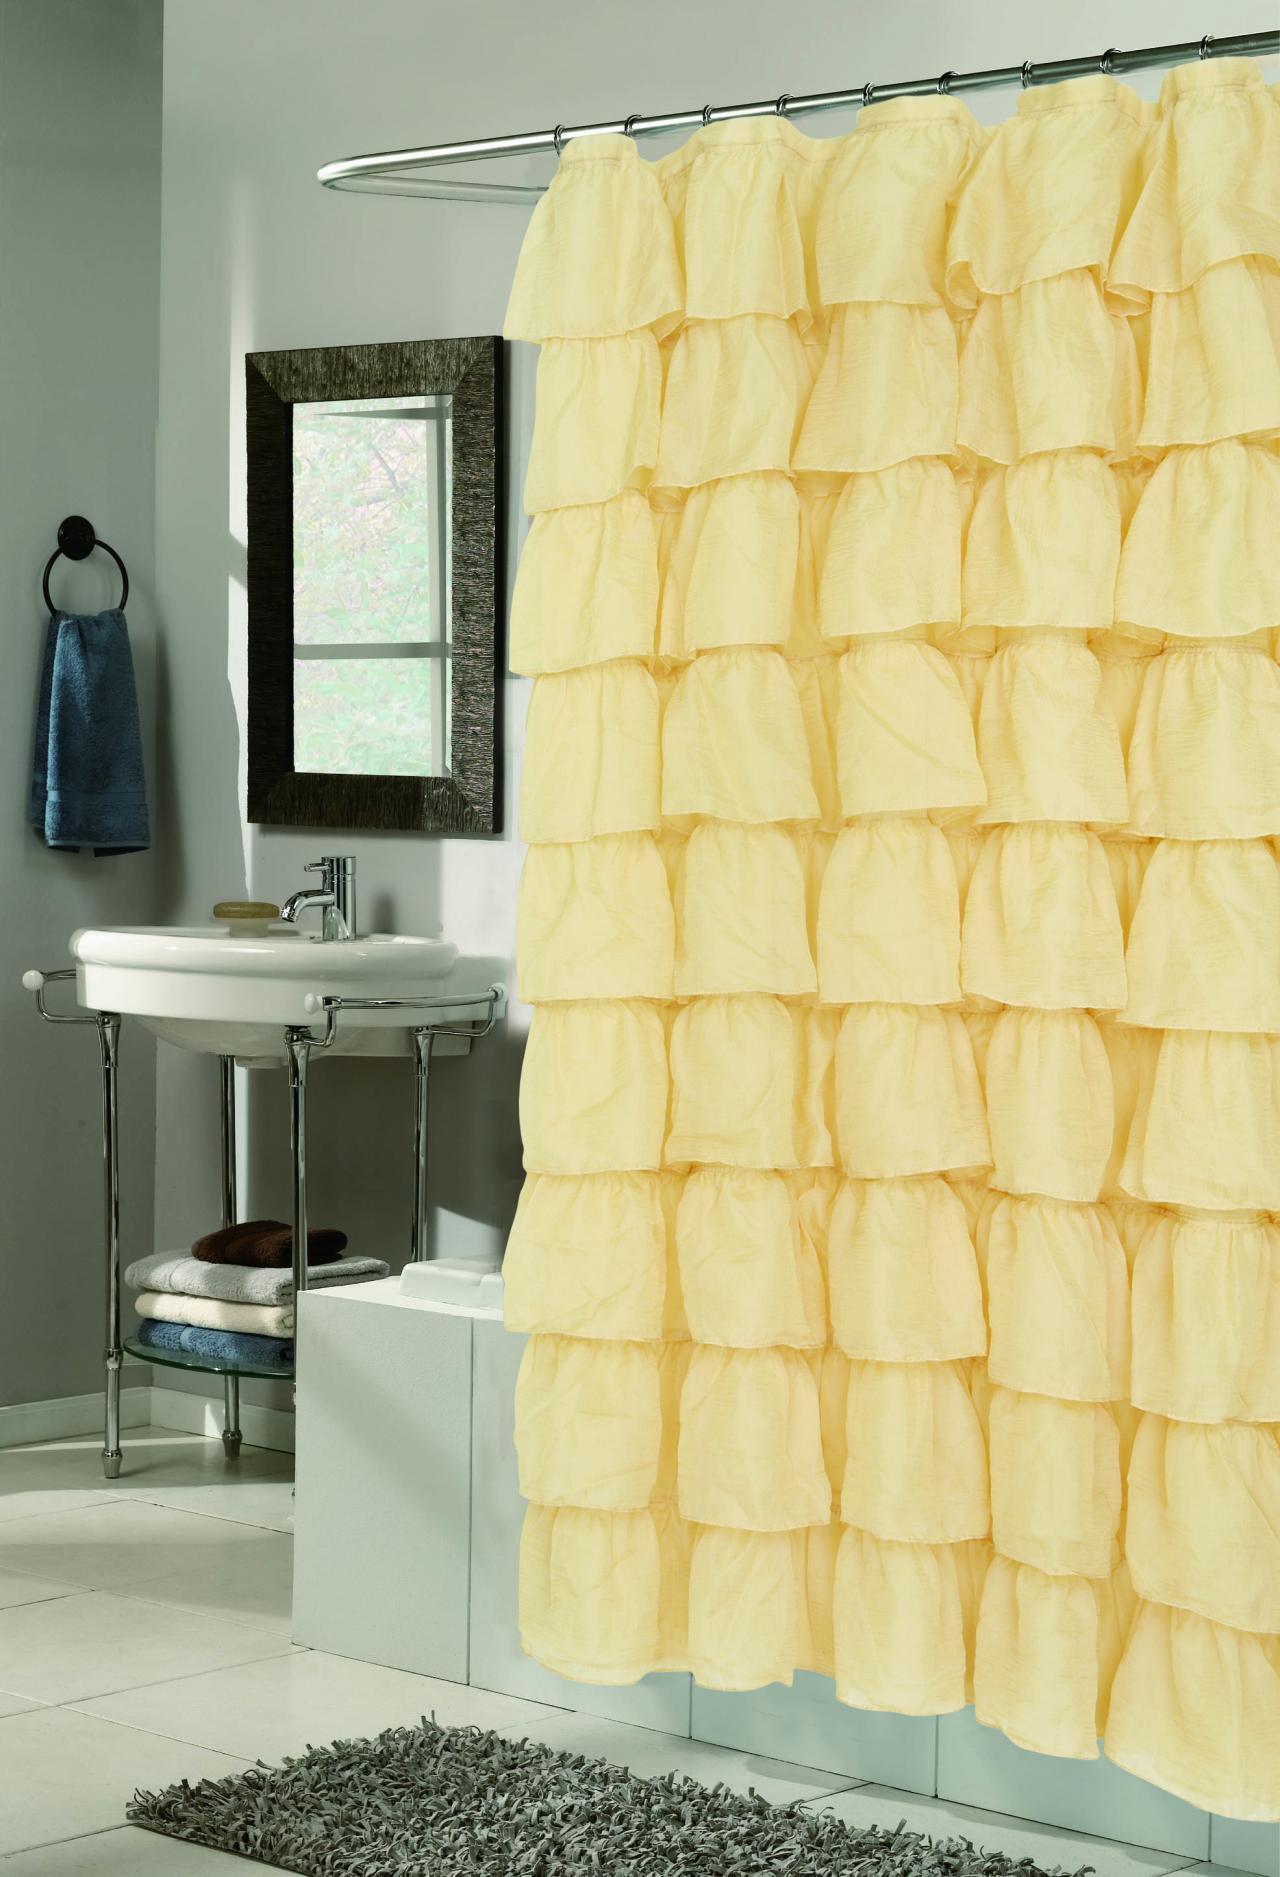 Шторки для ванной Шторка для ванной 178x183 Carnation Home Fashions Carmen золотая elitnaya-shtorka-dlya-vannoy-carmen-zolotaya-ot-carnation-ssha-kitay.jpg